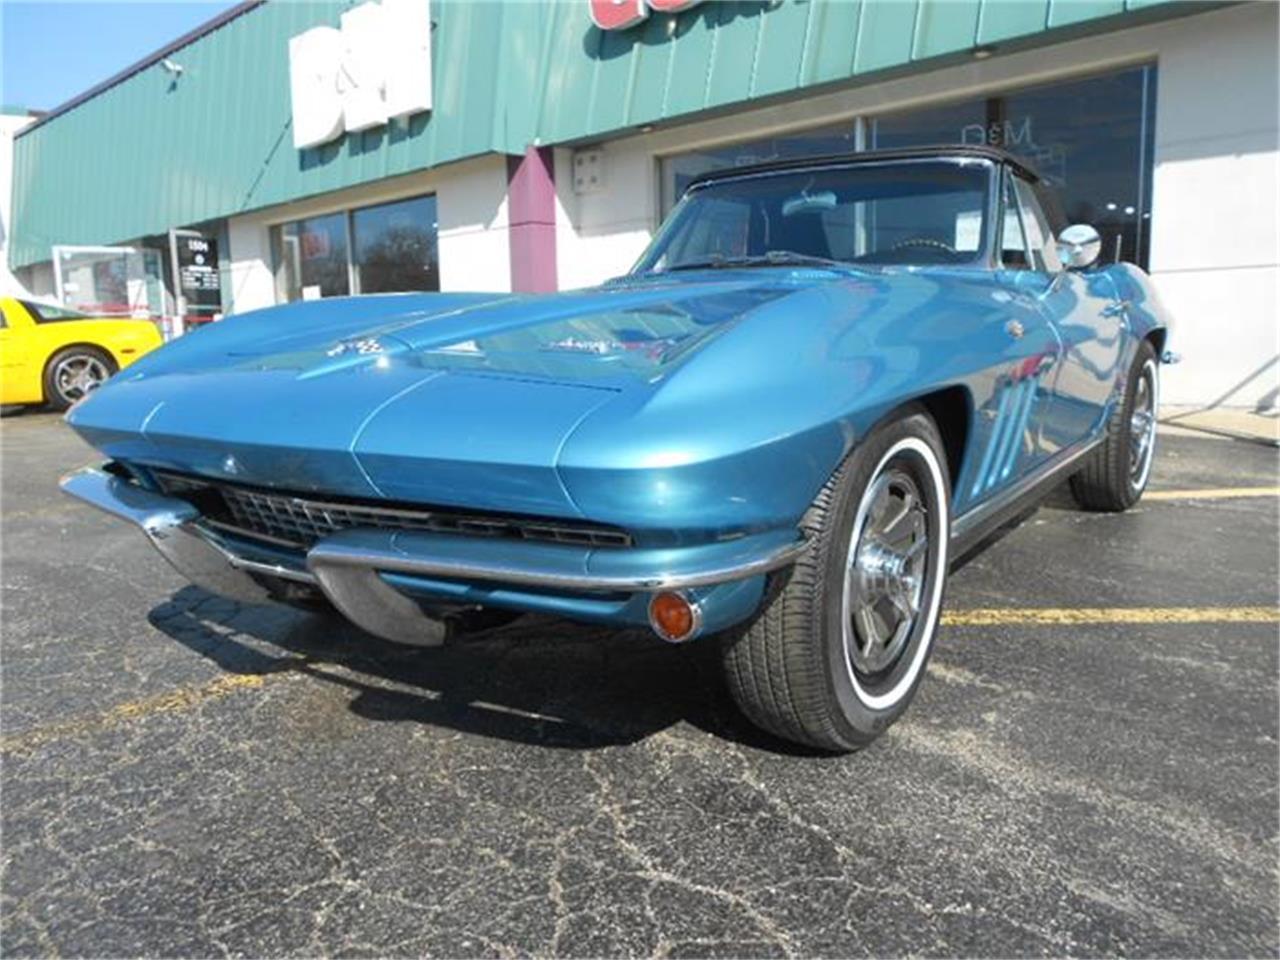 Large Picture of Classic '66 Chevrolet Corvette - $79,000.00 - B2SE